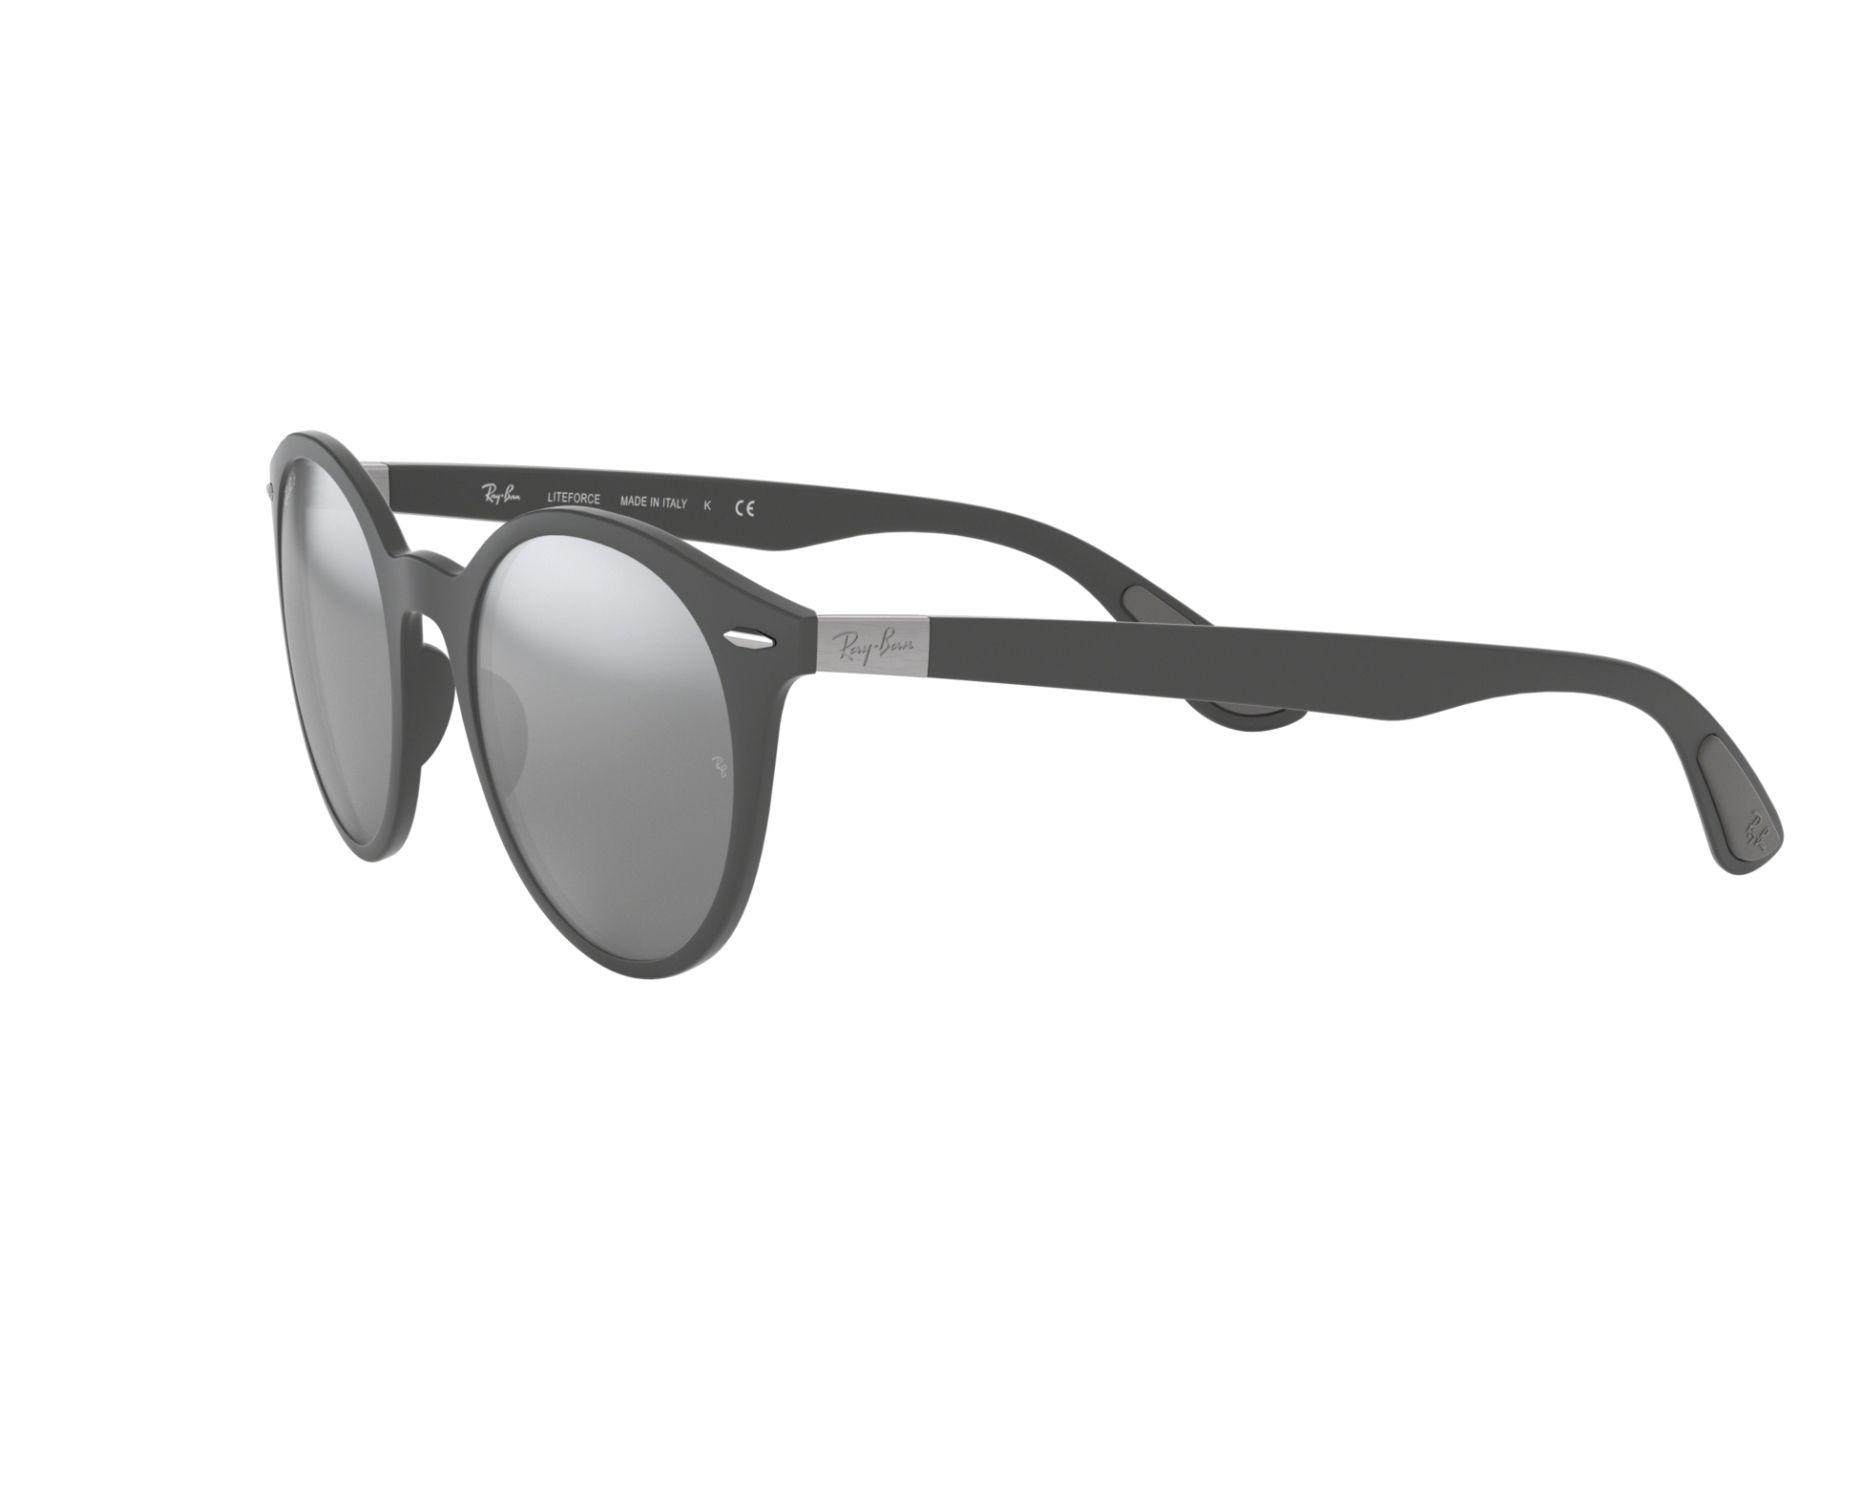 4929f3b7a6 Sunglasses Ray-Ban RB-4296 633288 51-21 Grey 360 degree view 3